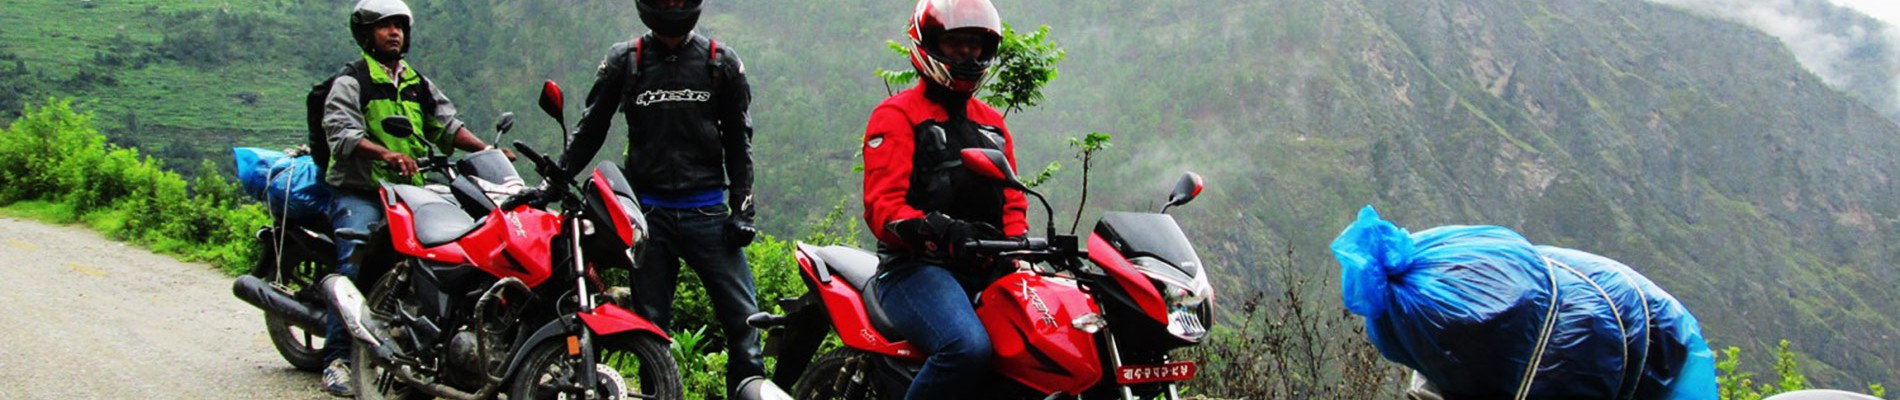 Nepal: 22d Motorbike adventure tours over the Himalaya of Nepal